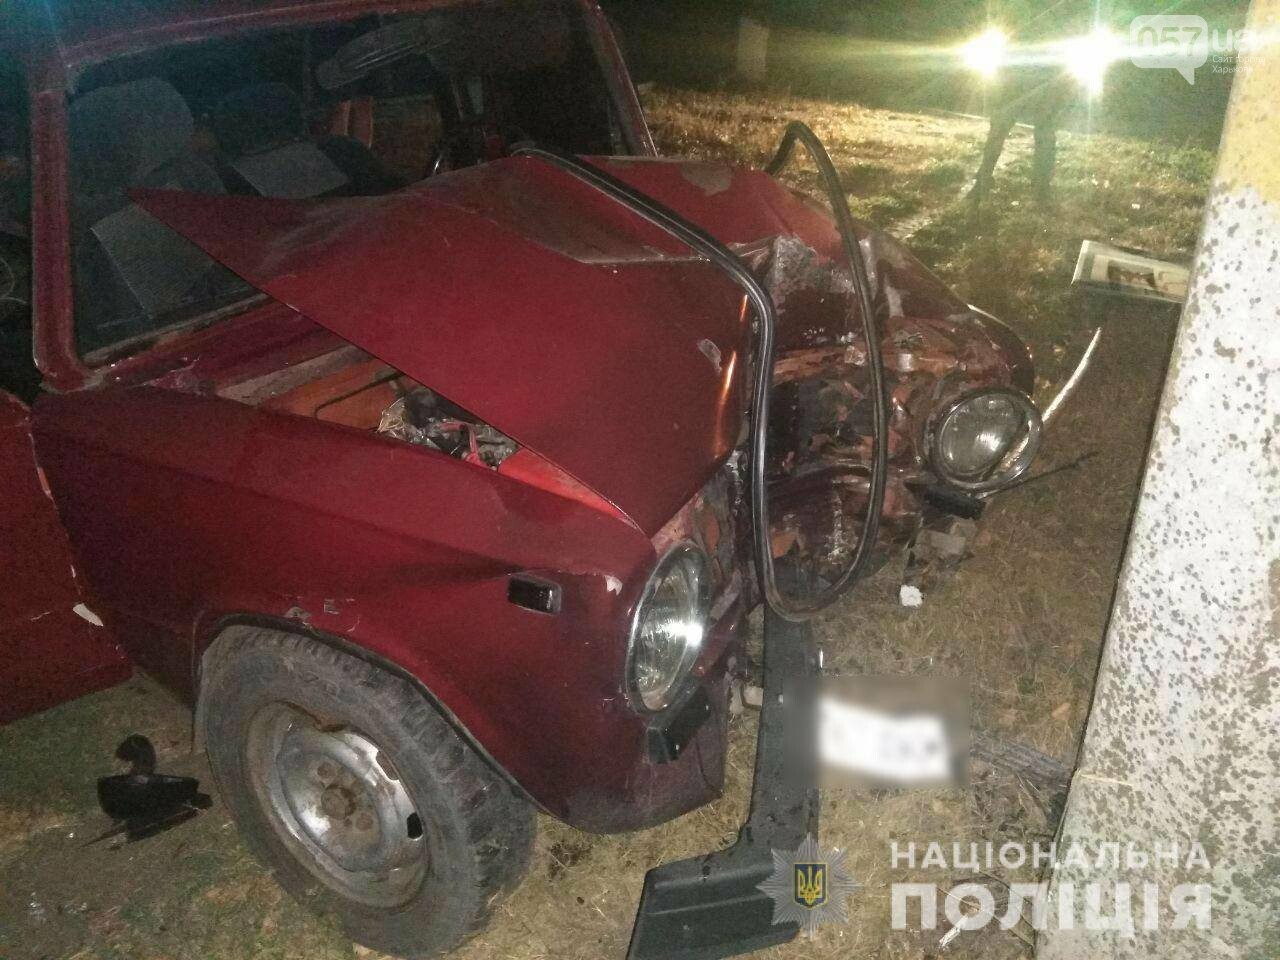 Харьковчанин за рулем «ВАЗ» влетел в электрический столб и умер,- ФОТО, фото-2